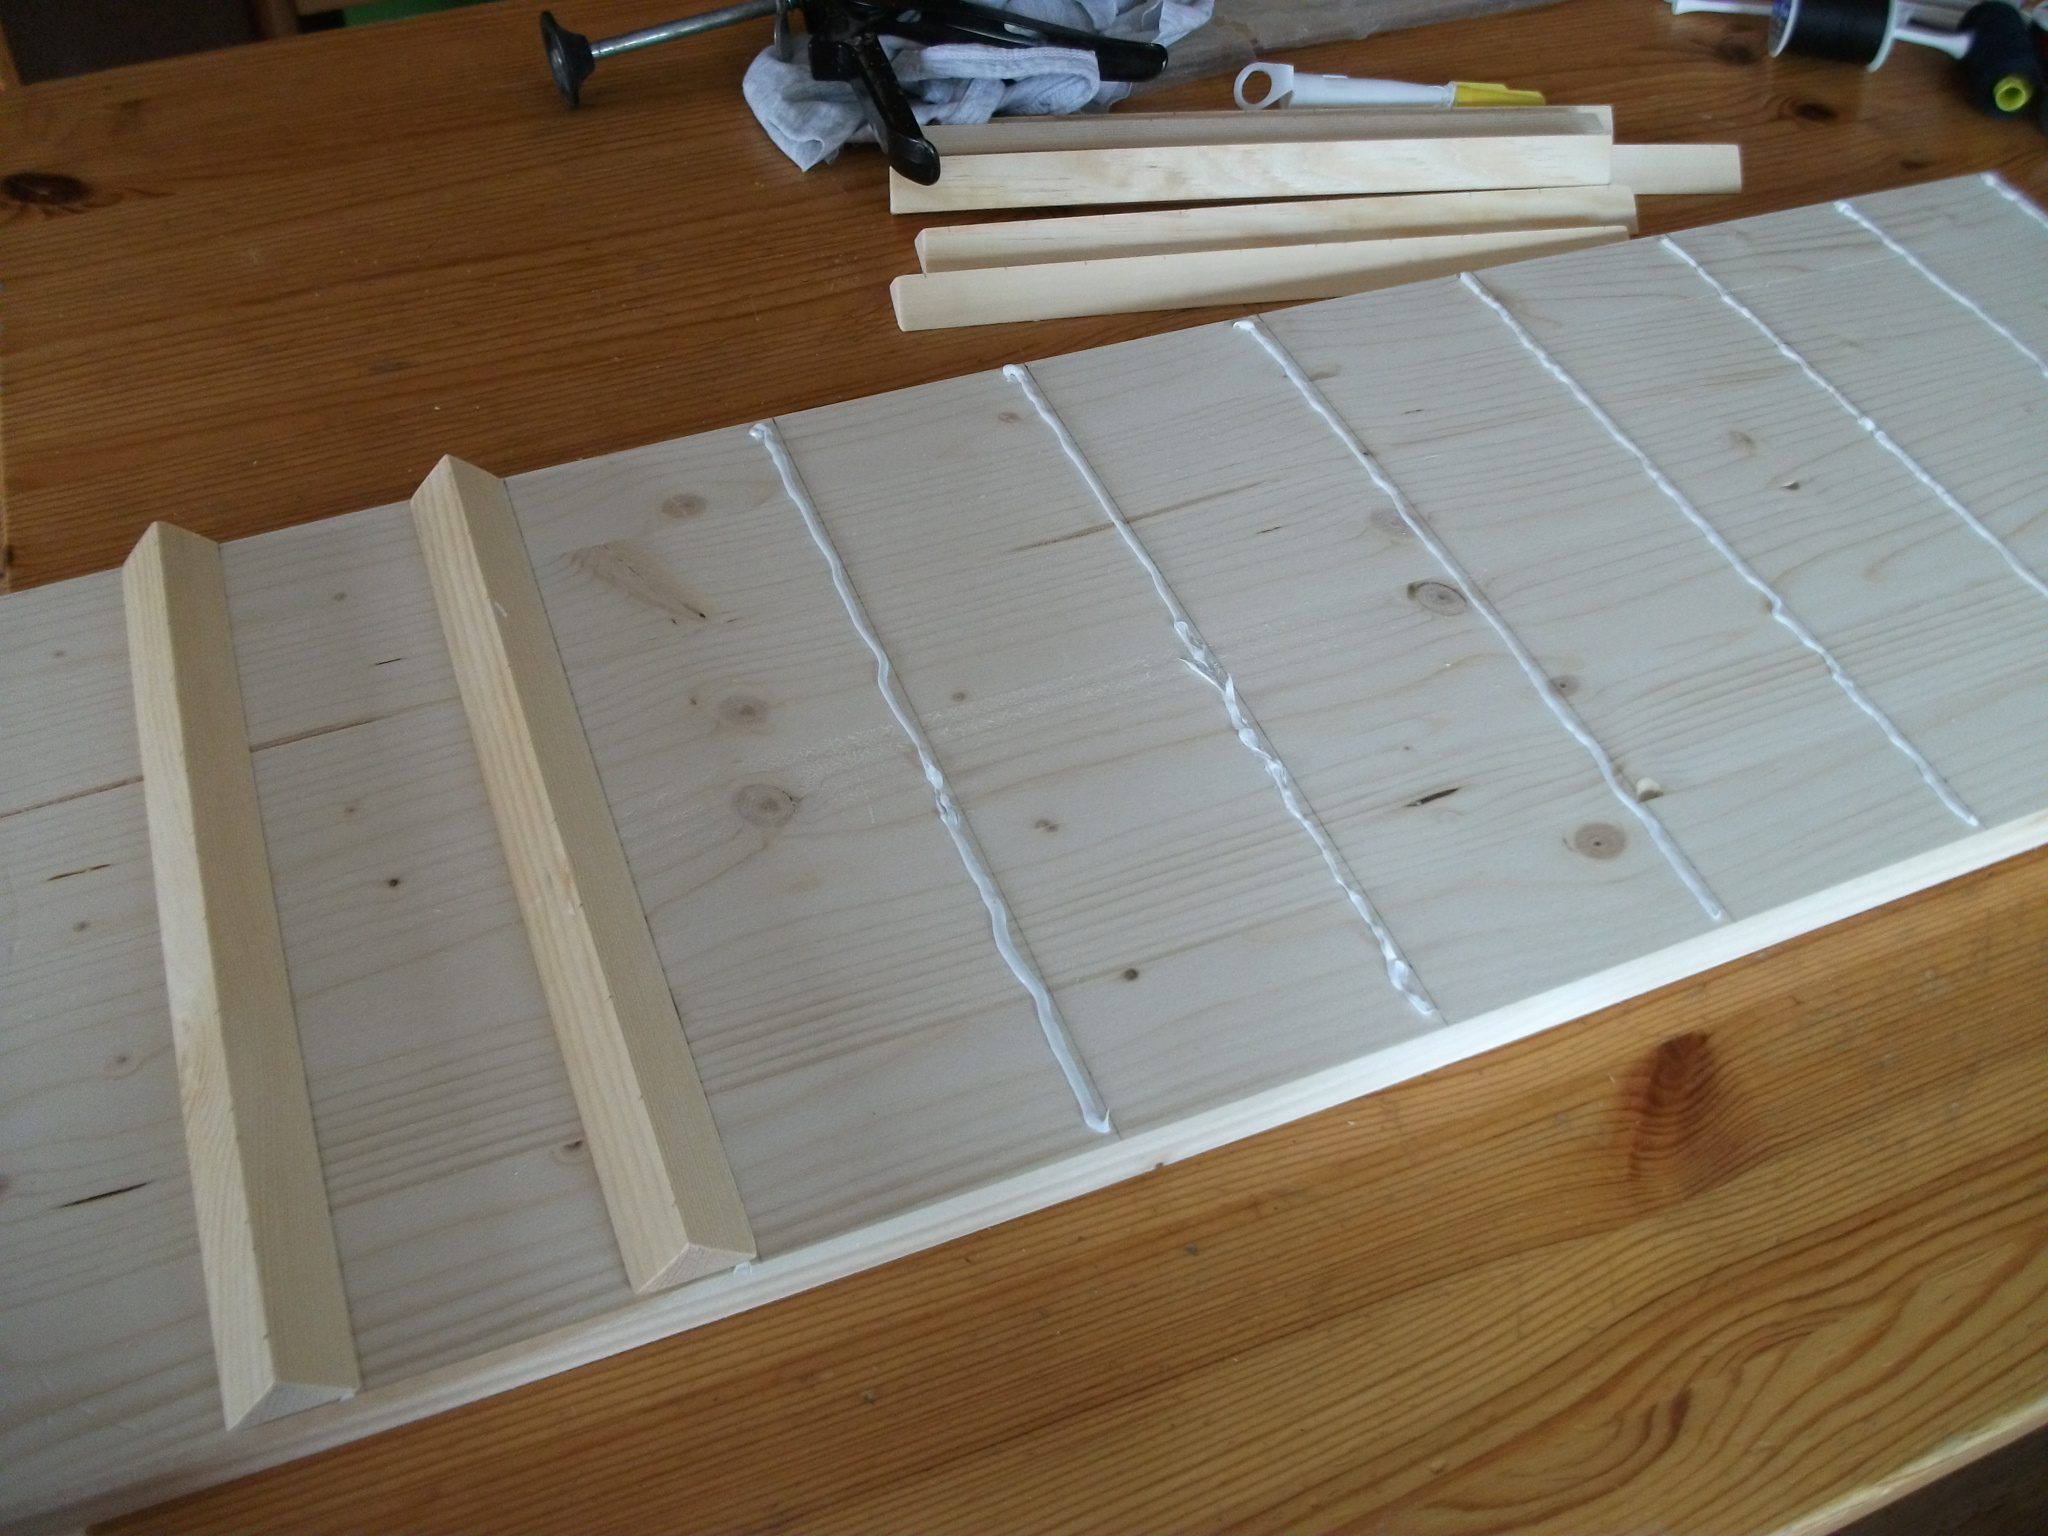 garnrollenhalter selber bauen my toolbox mein bastel. Black Bedroom Furniture Sets. Home Design Ideas